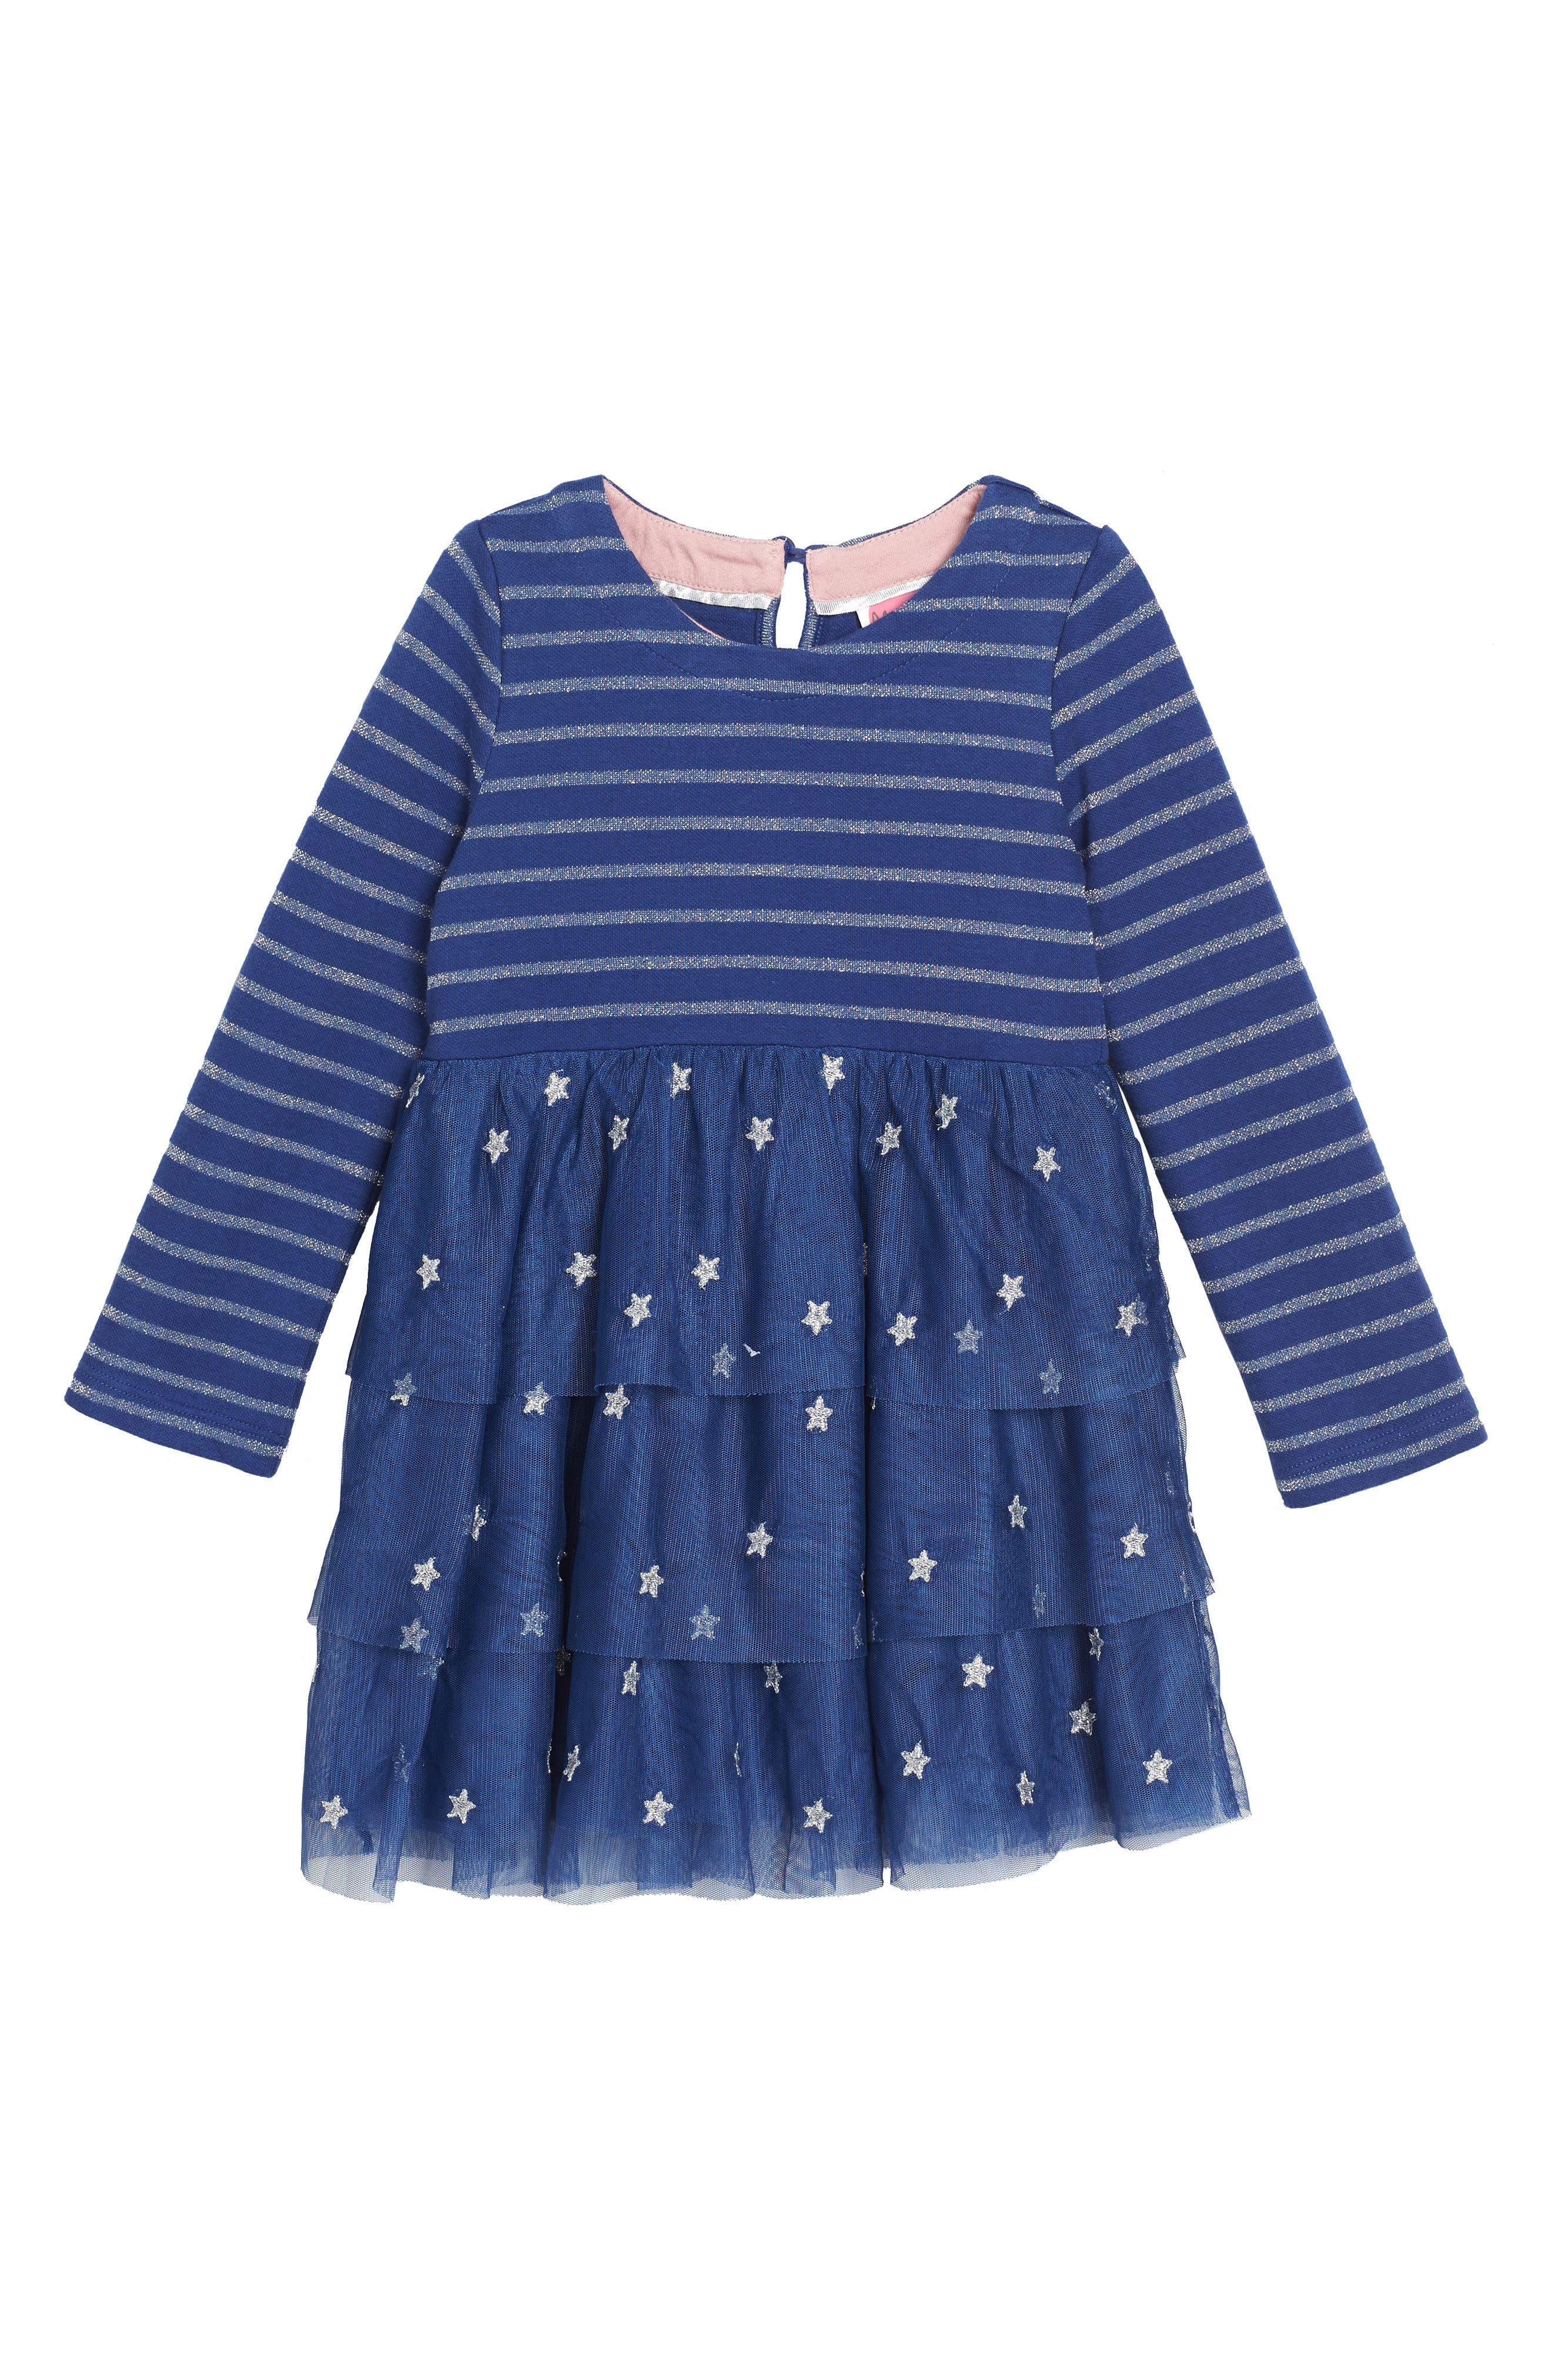 Mini Boden Sparkly Party Dress (Toddler Girls, Little Girls & Big Girls)